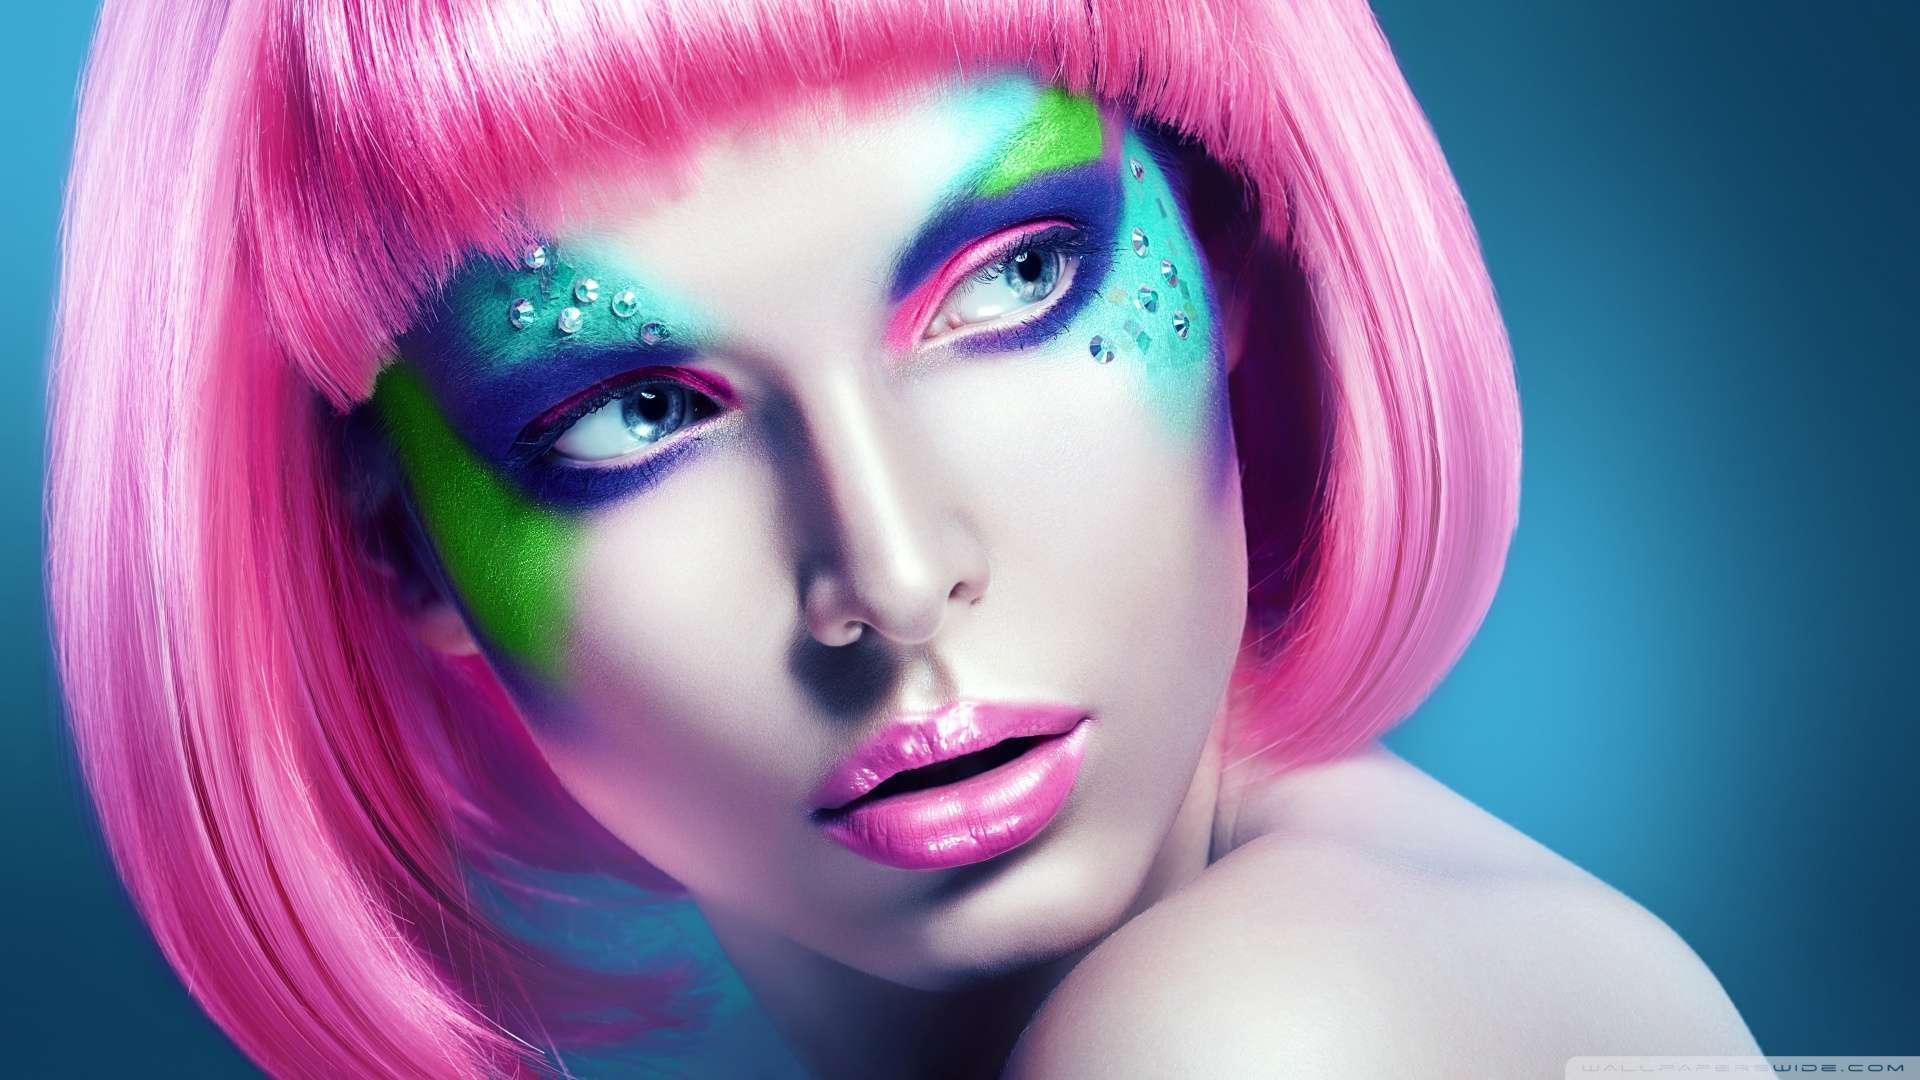 animated makeup wallpaper - photo #48